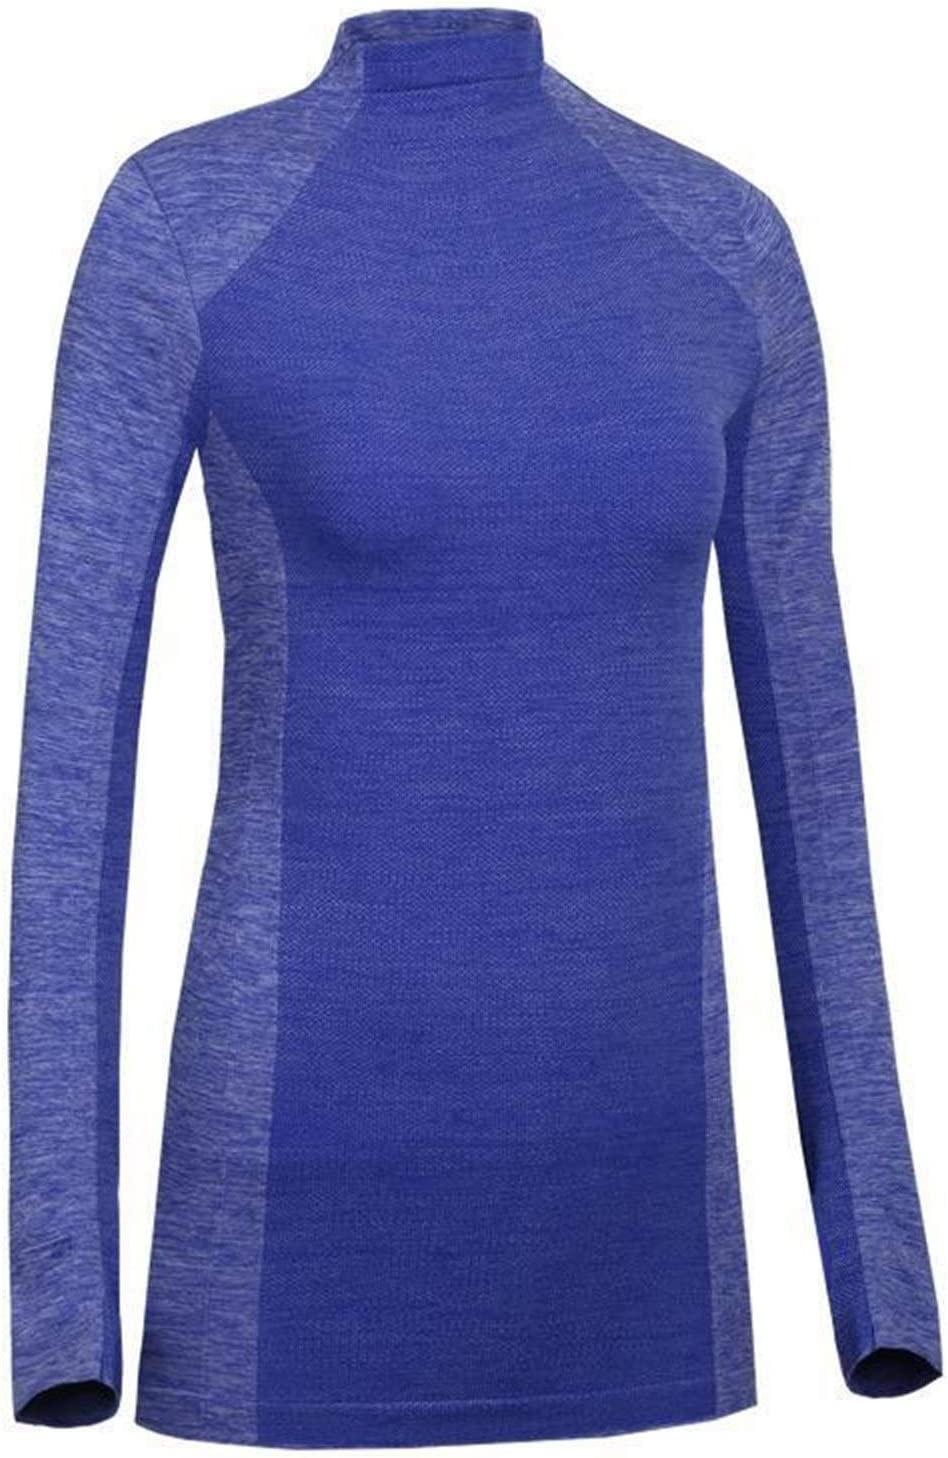 ZHANGZEHONG New Brand Tracksuit Thermal Underwear Women Winter Fast Dry High Elastic Long Underwear Heat Pack Women Warm Two Piece Set (Color : C2, Size : Medium)